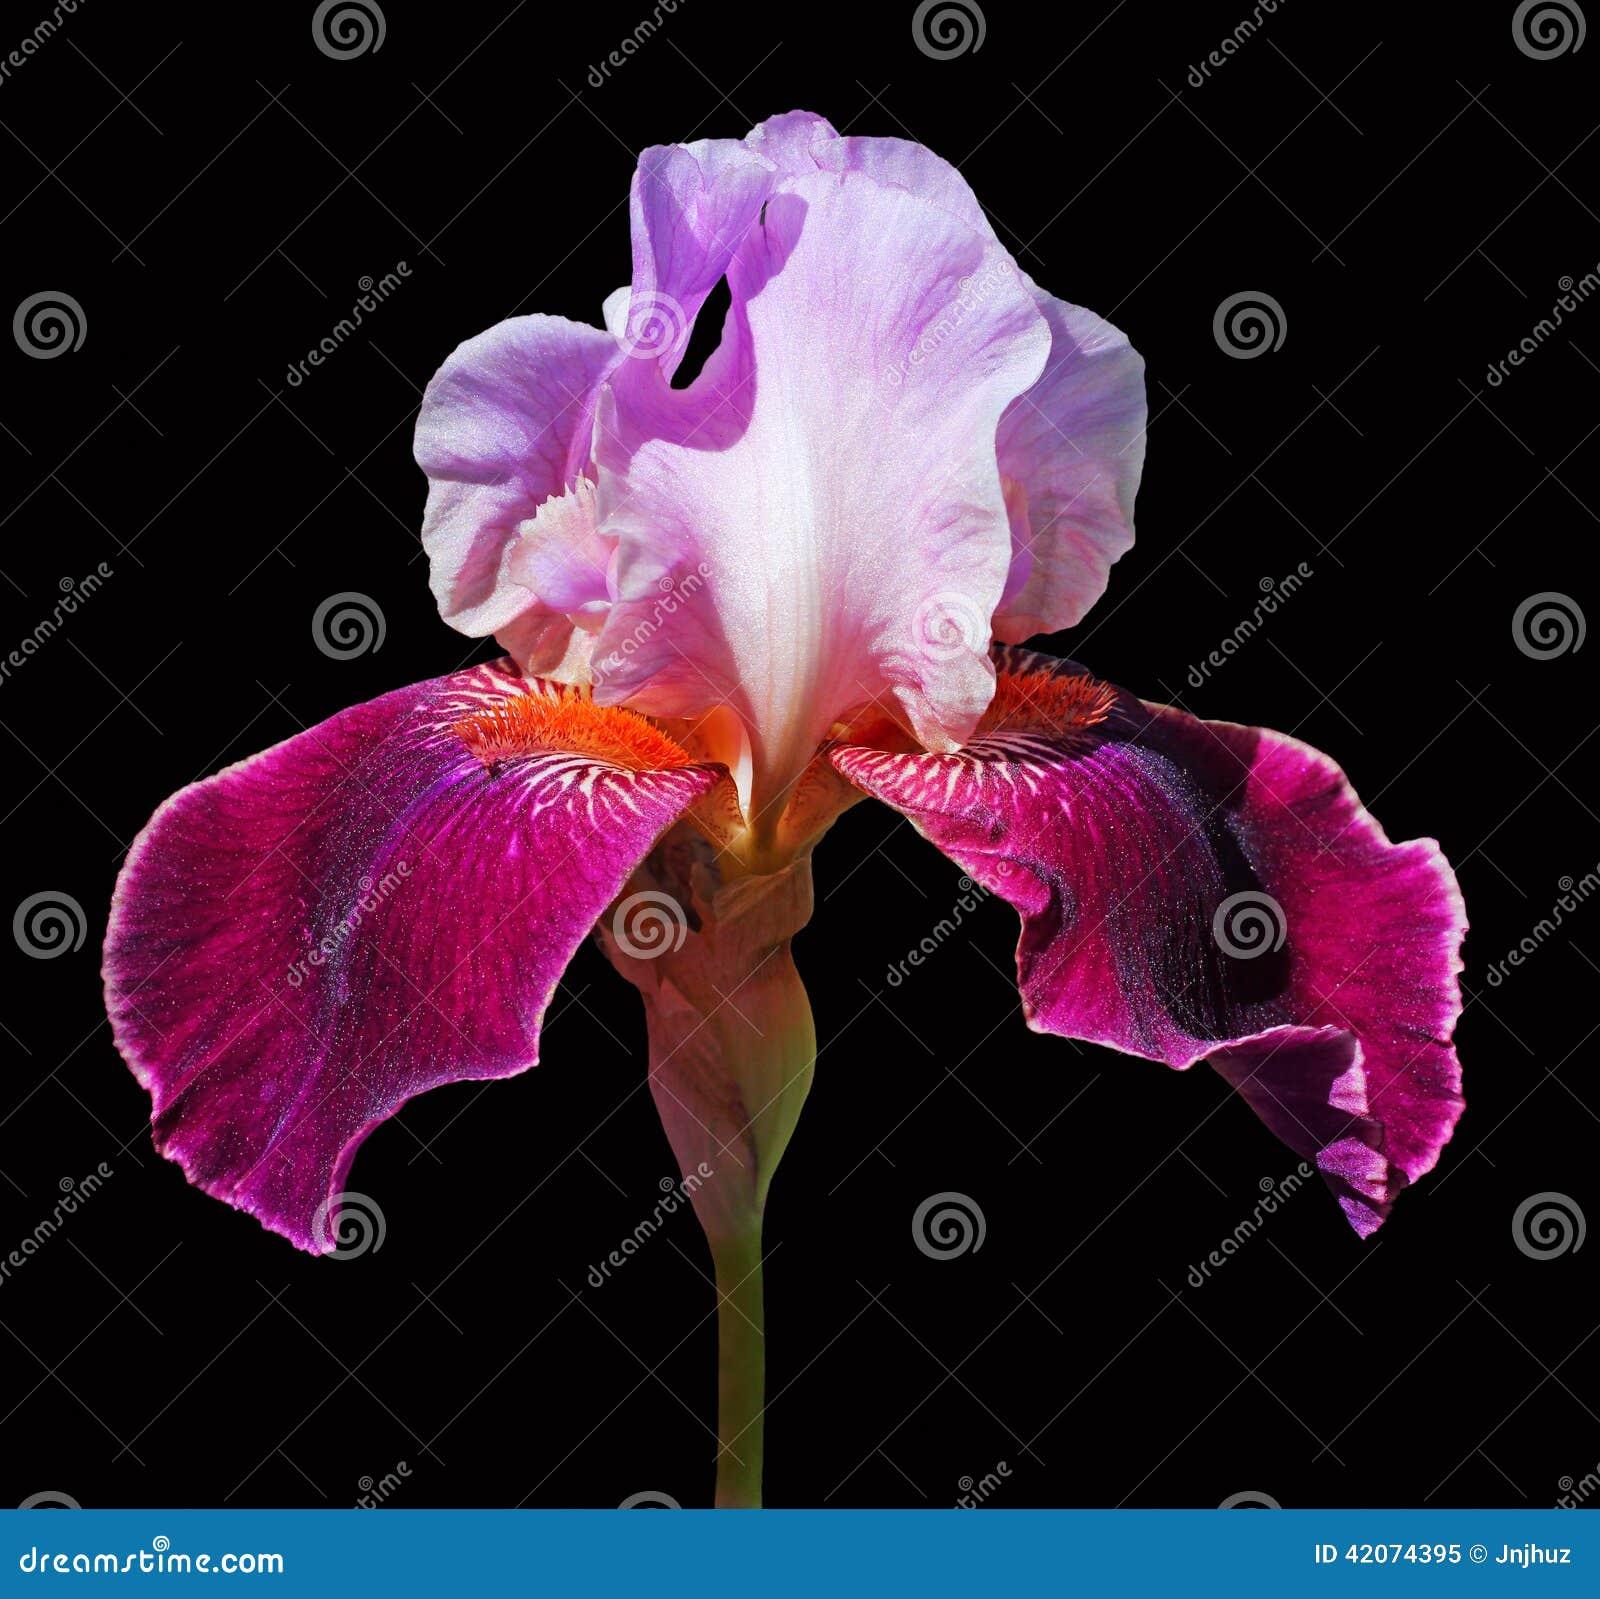 Bearded Iris Flower Stock Image Image Of Backdraft Plant 42074395